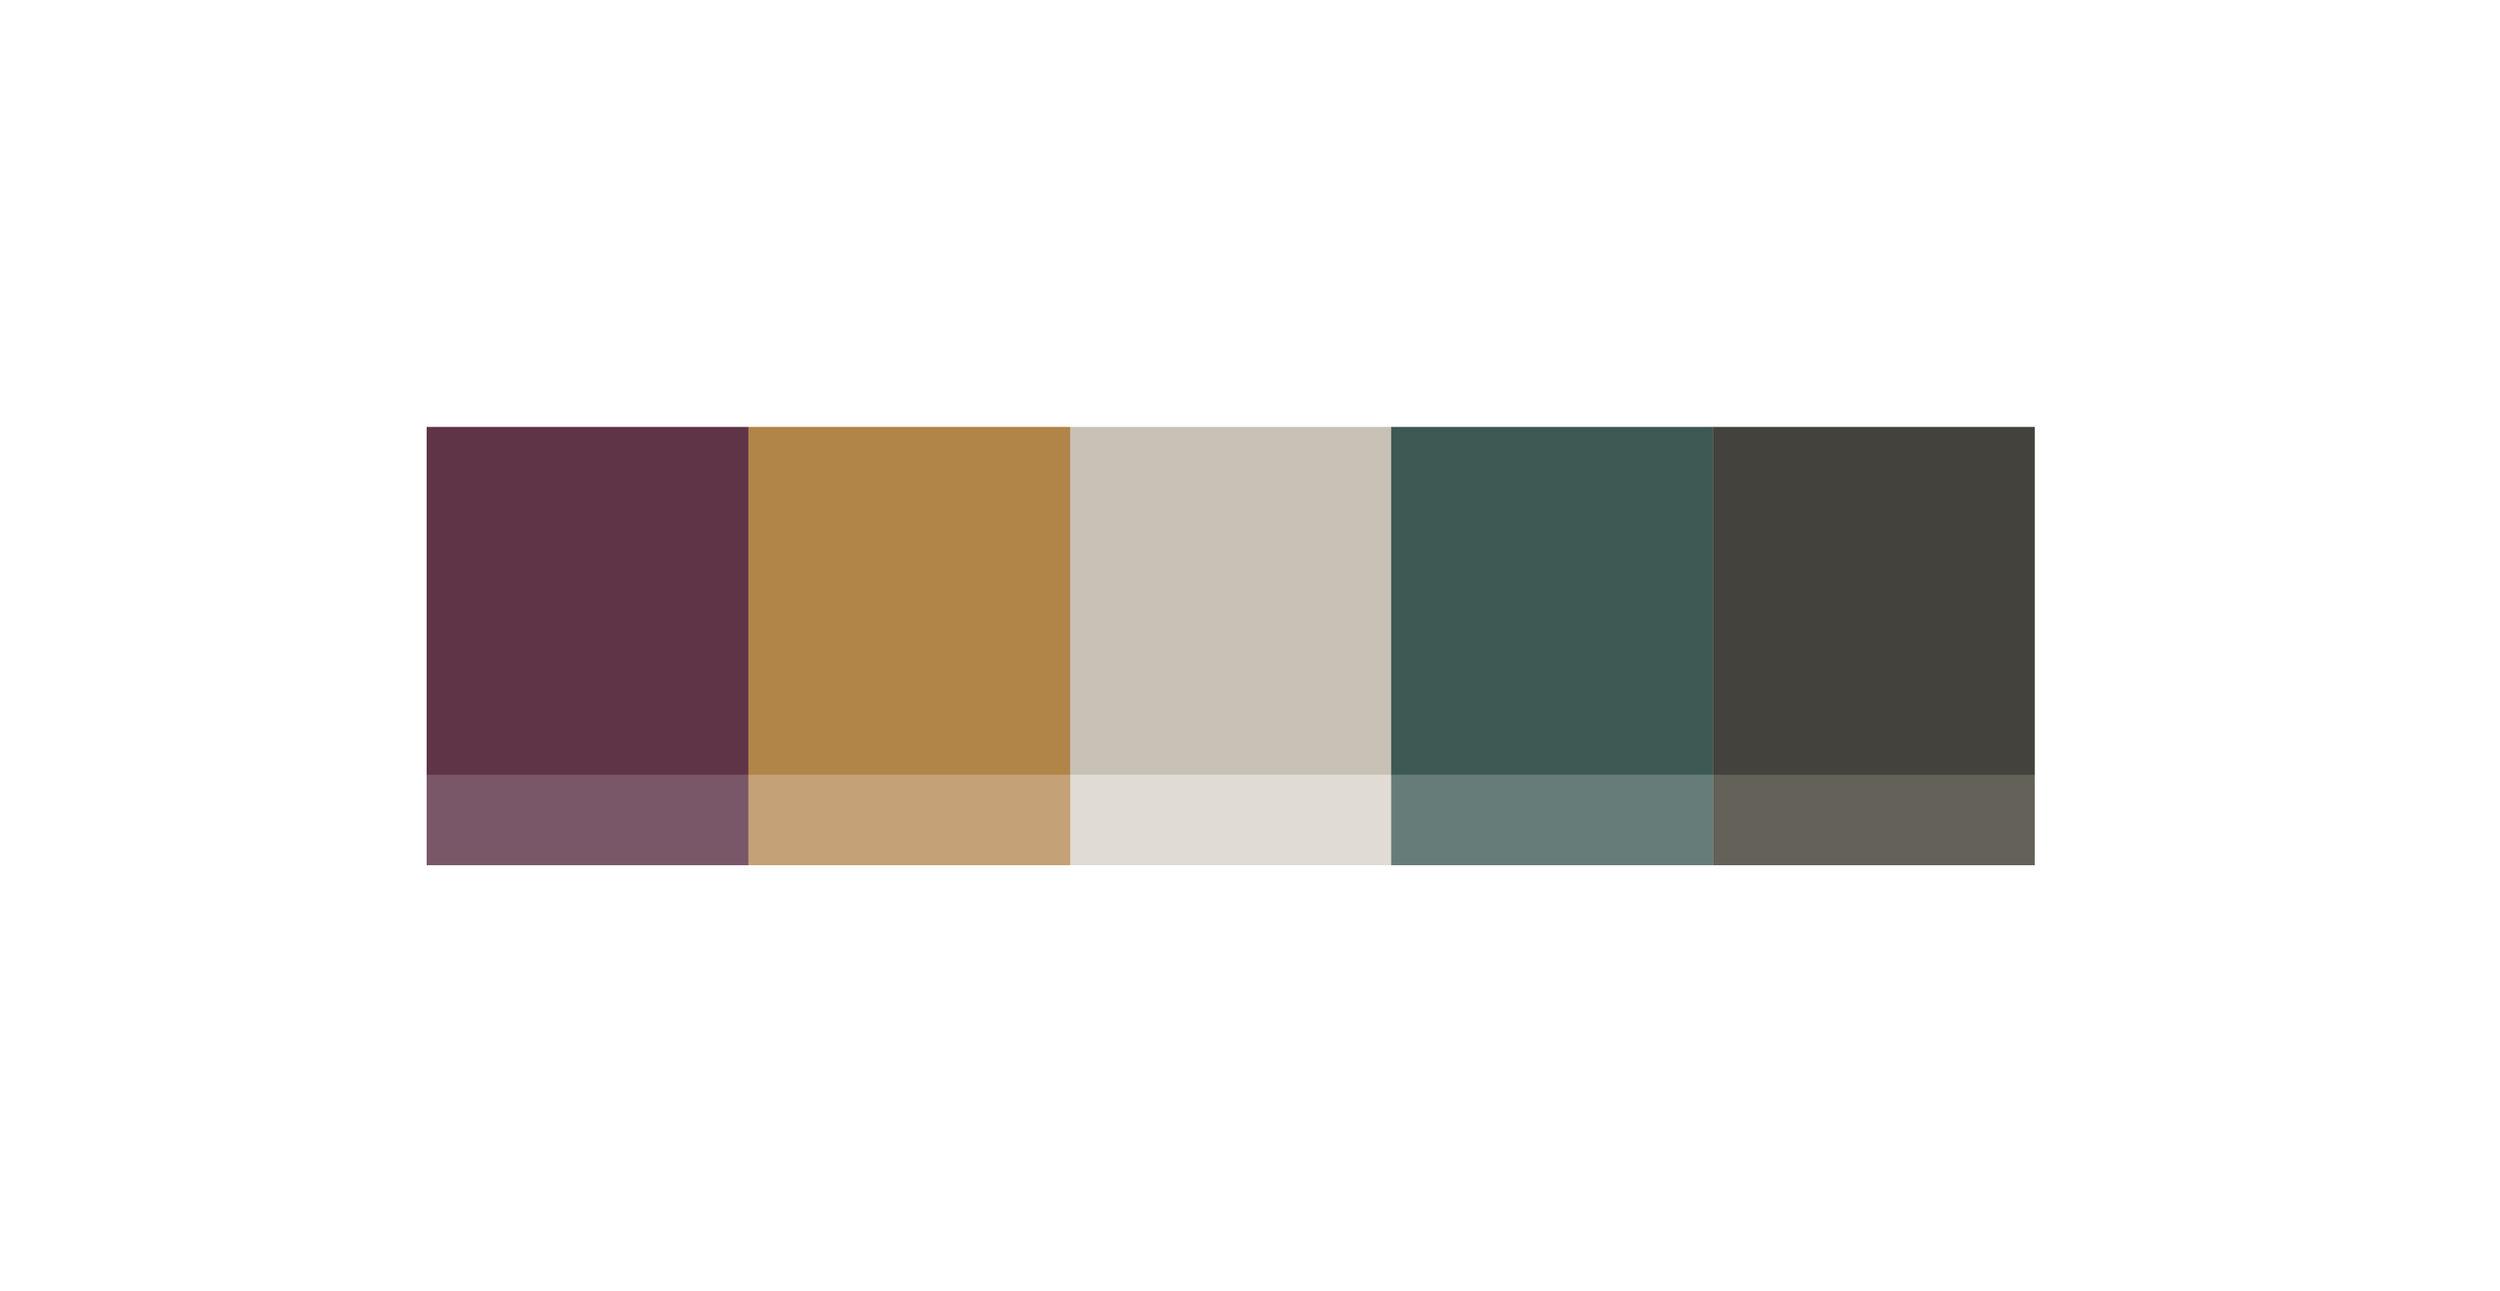 LynseyCreative_HitchedXO_Portfolio_colorpalette.jpg